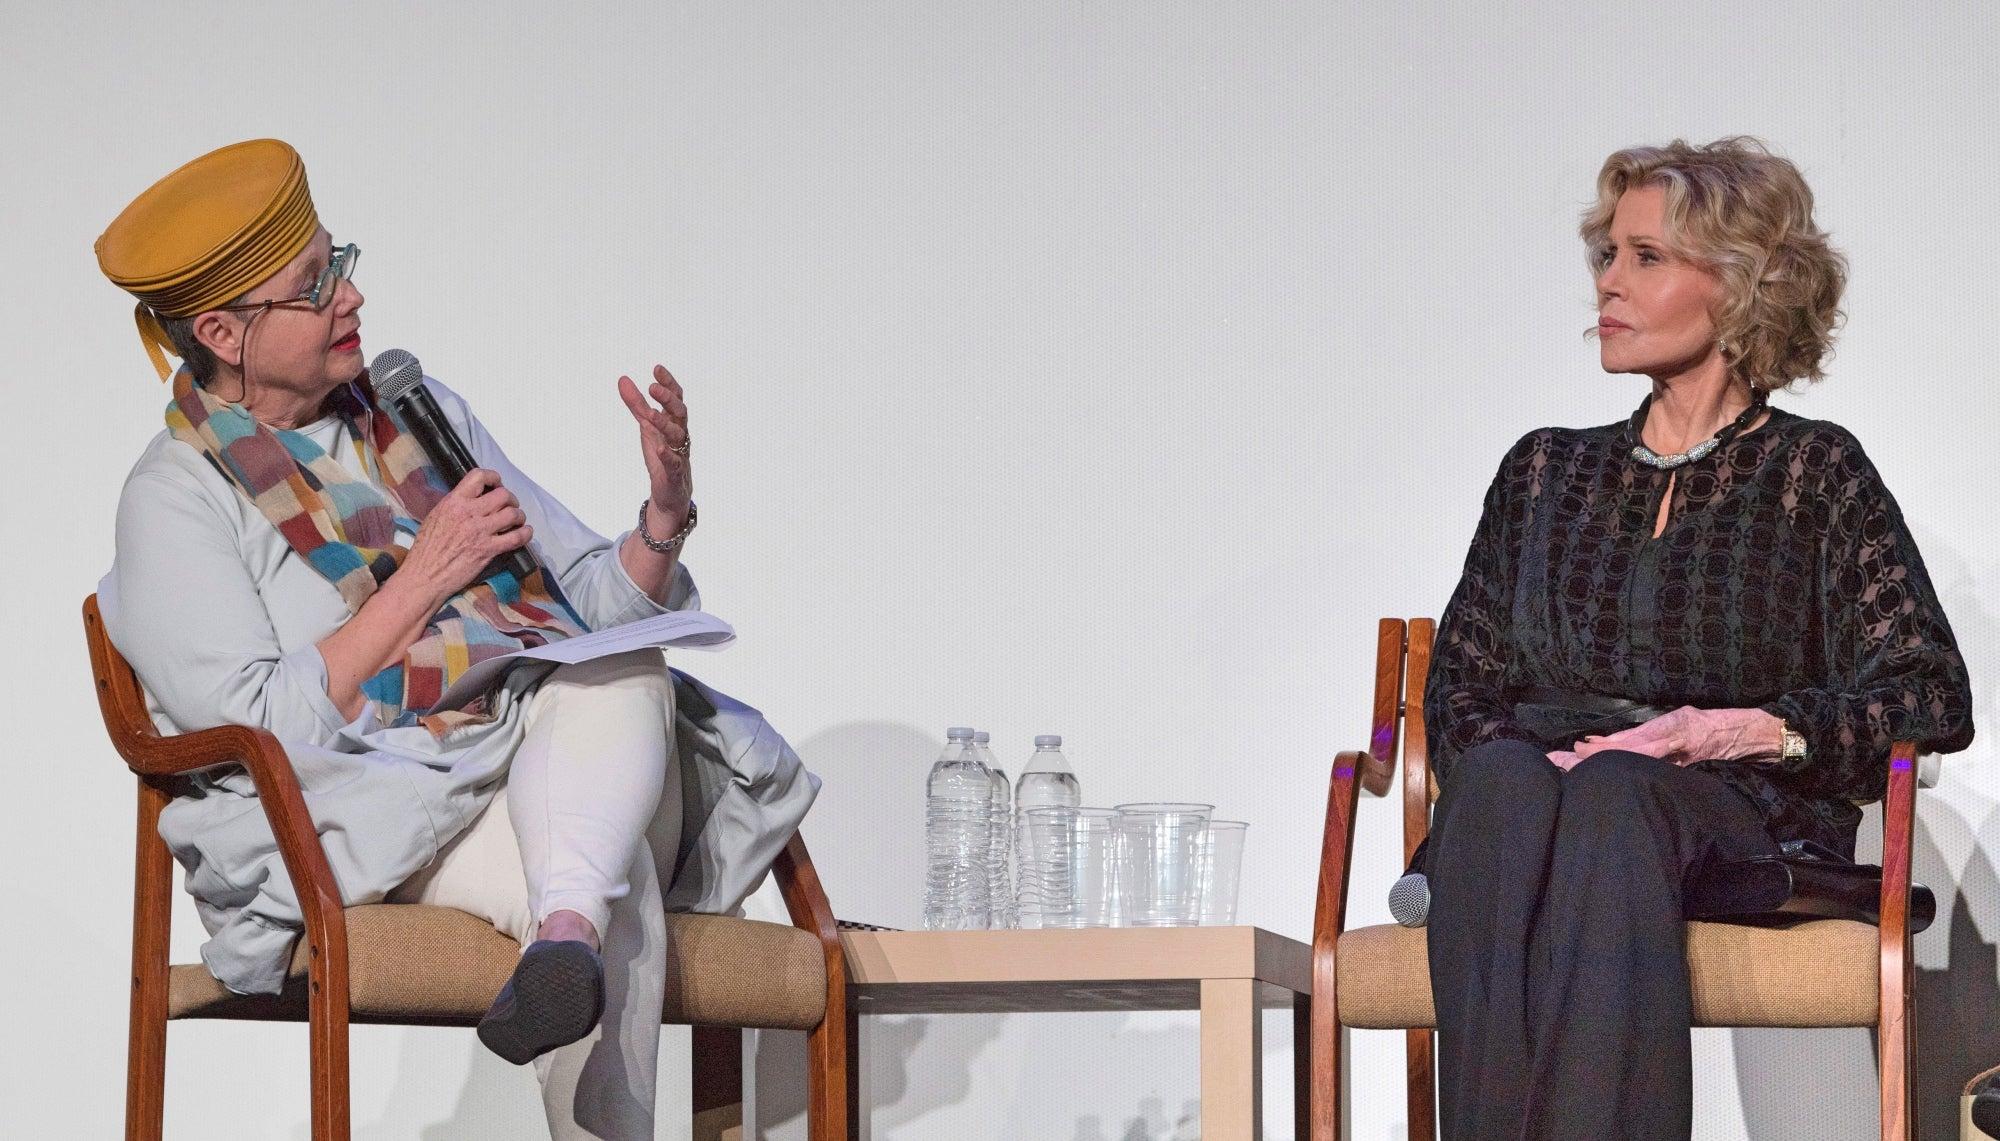 Sandra Schulberg interviews Jane Fonda at the HFPA Restoration Summit 2019